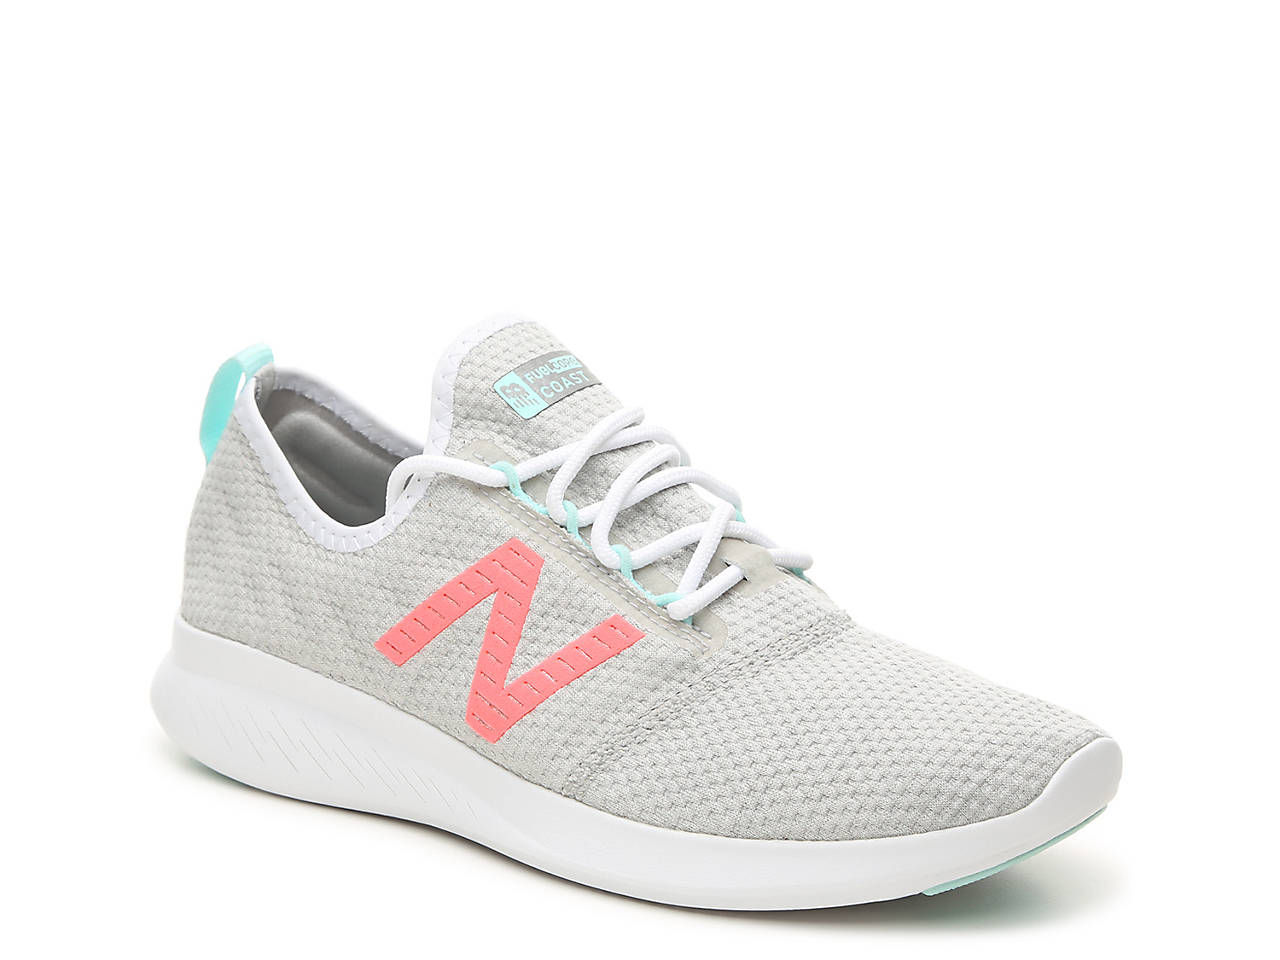 52074db2cf8b New Balance Fuelcore Coast Lightweight Running Shoe - Women s ...